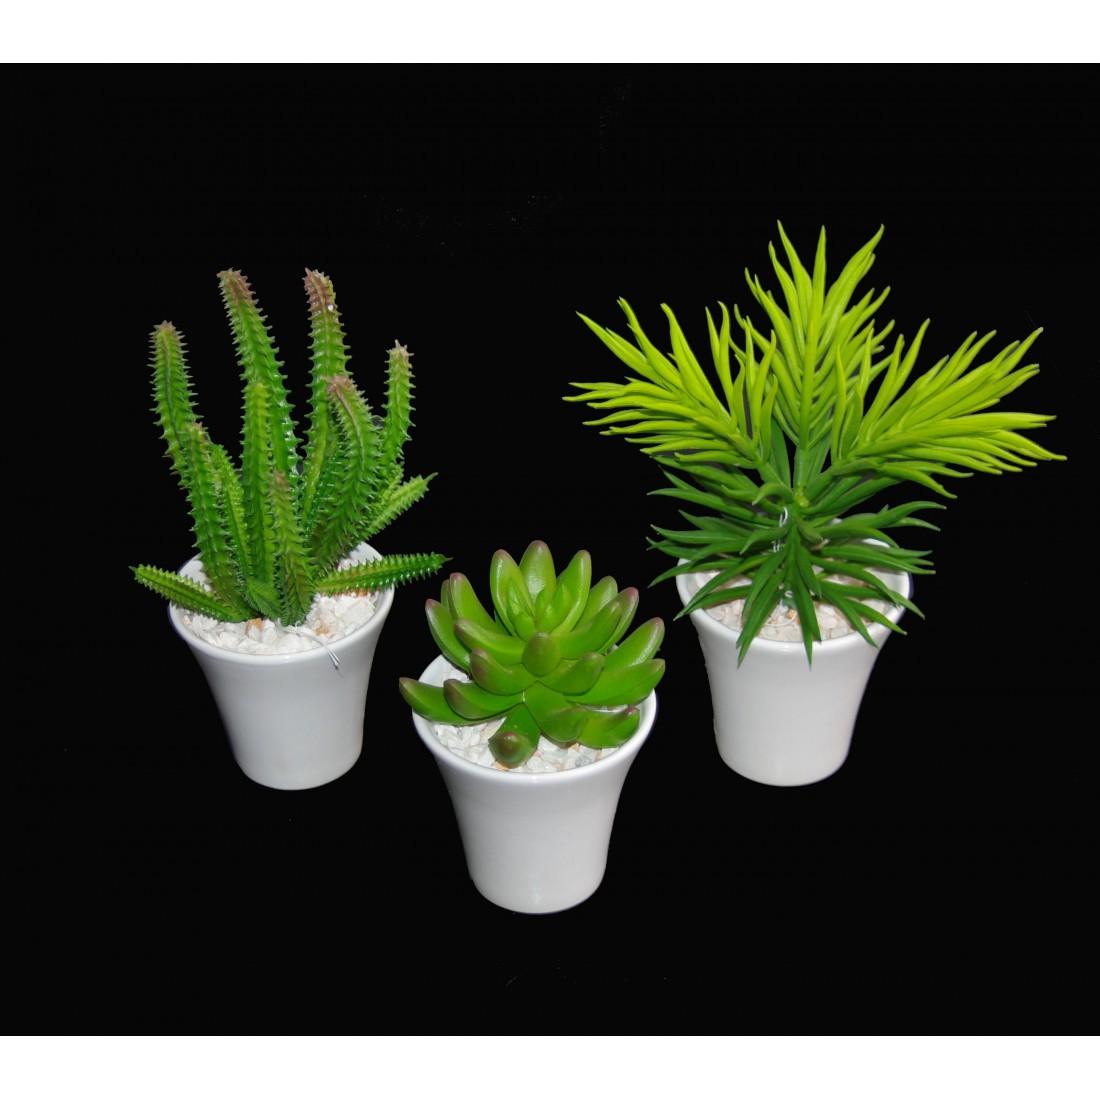 cactus artificiel en pot 18 cm mini cactus plantes. Black Bedroom Furniture Sets. Home Design Ideas